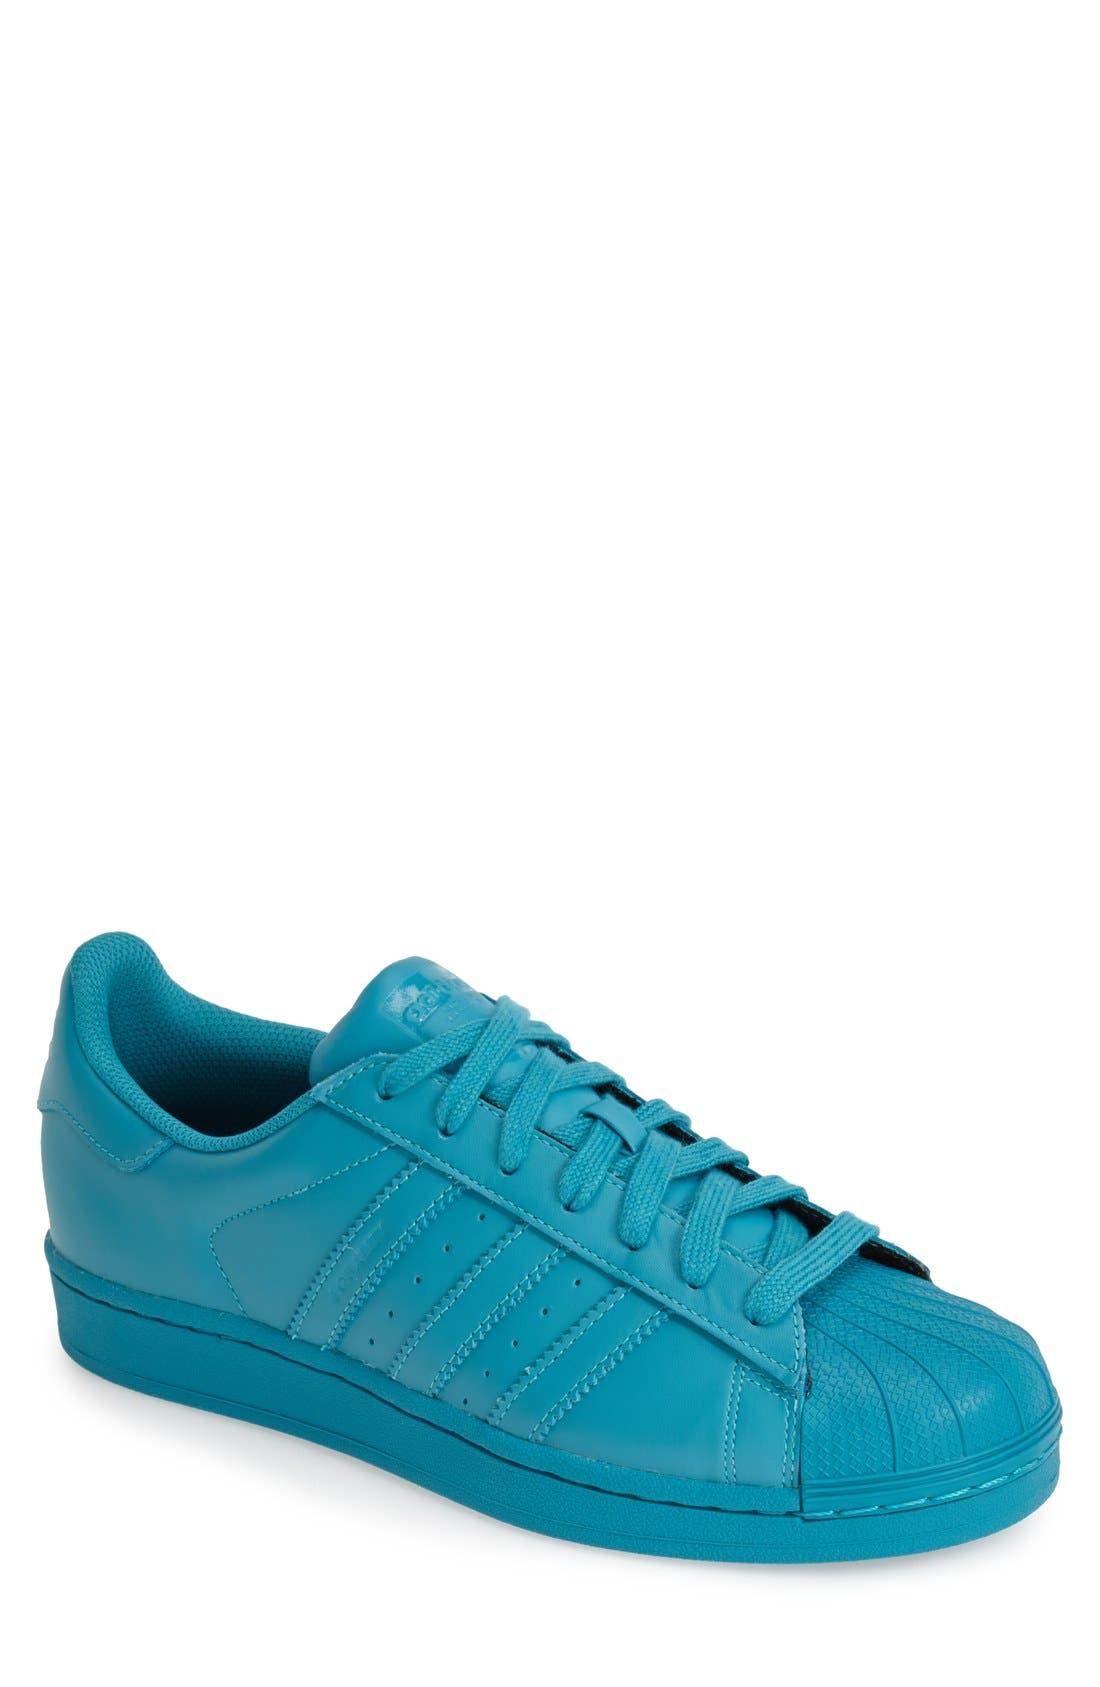 'Pharrell Williams - Superstar Supercolor' Sneaker, Main, color, 300